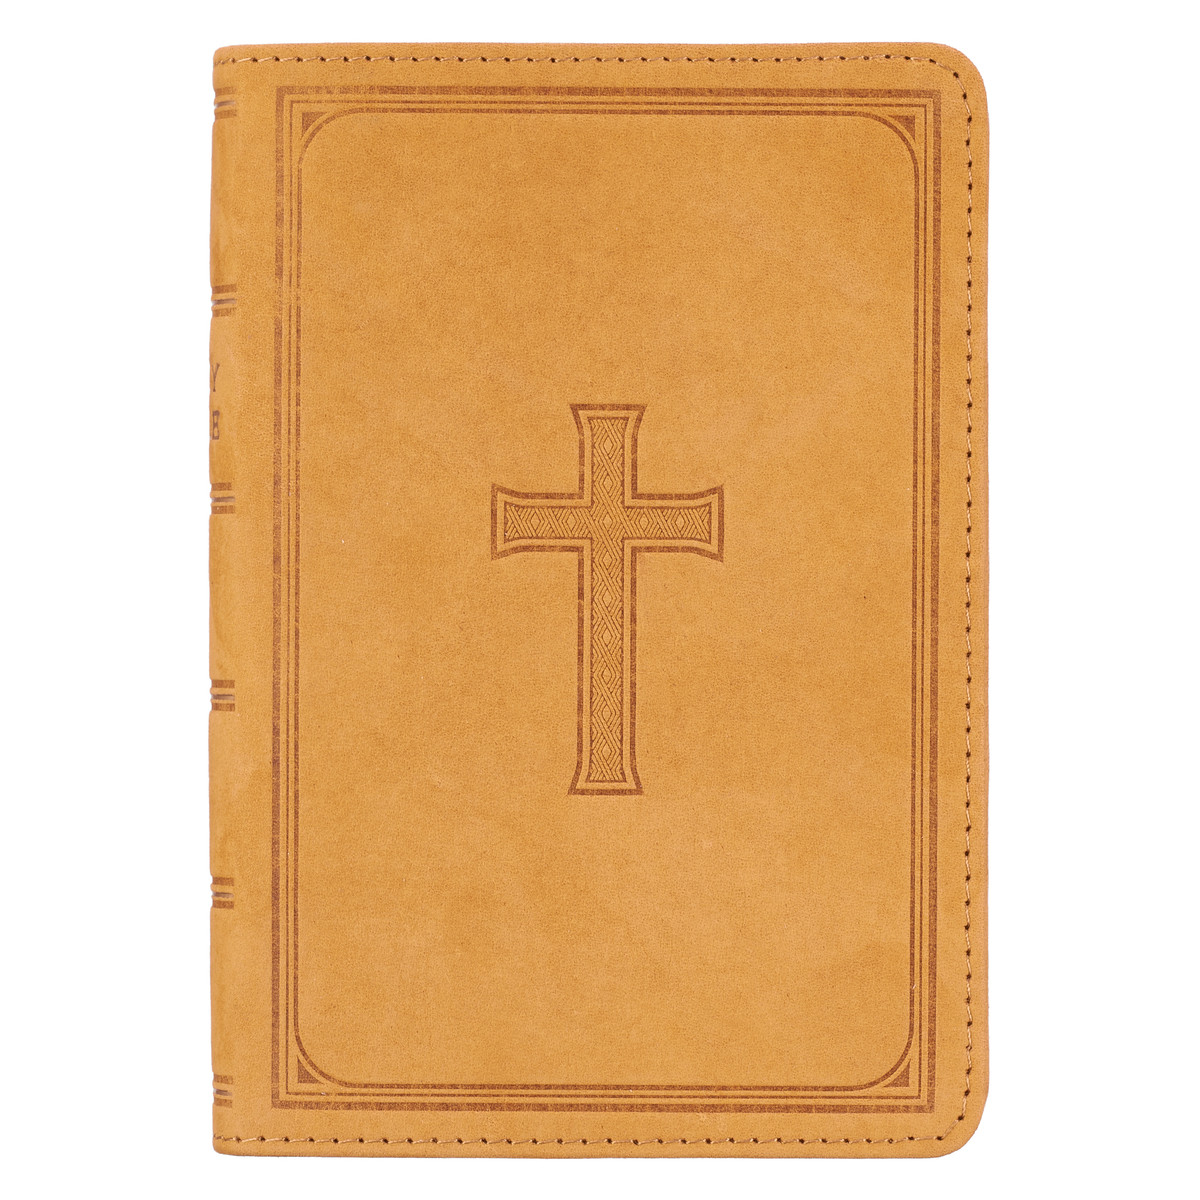 Premium Leather Tan KJV Bible Large Print Compact